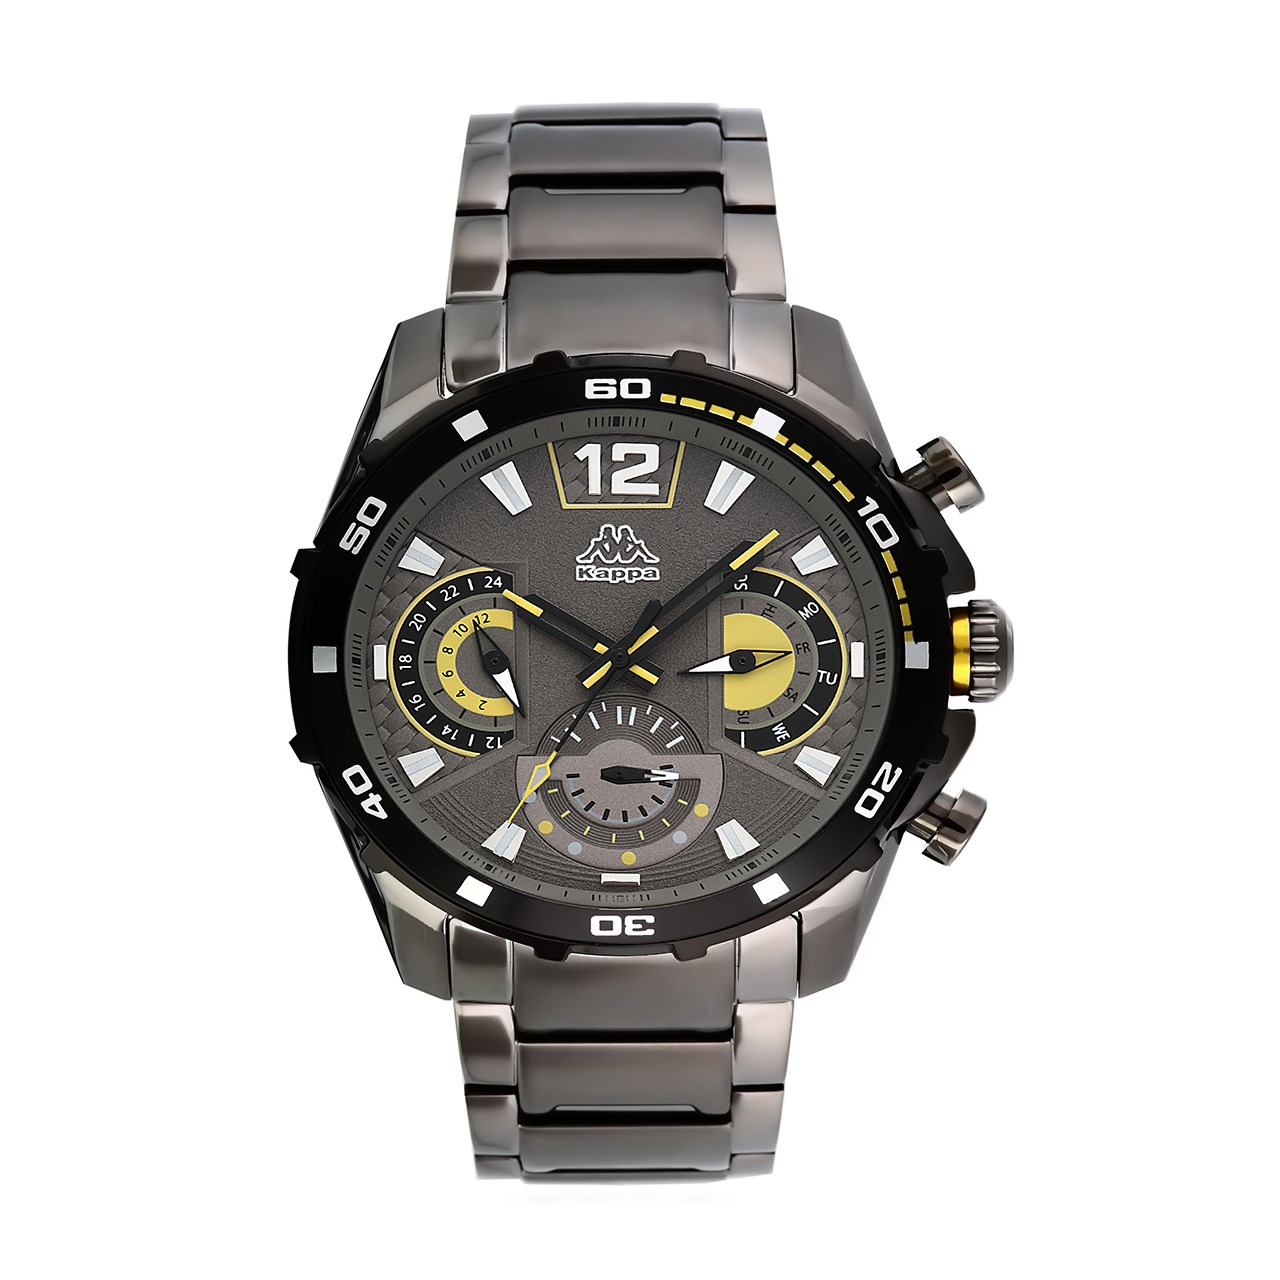 ساعت مچی  کاپا مدل 1408m-b              اصل